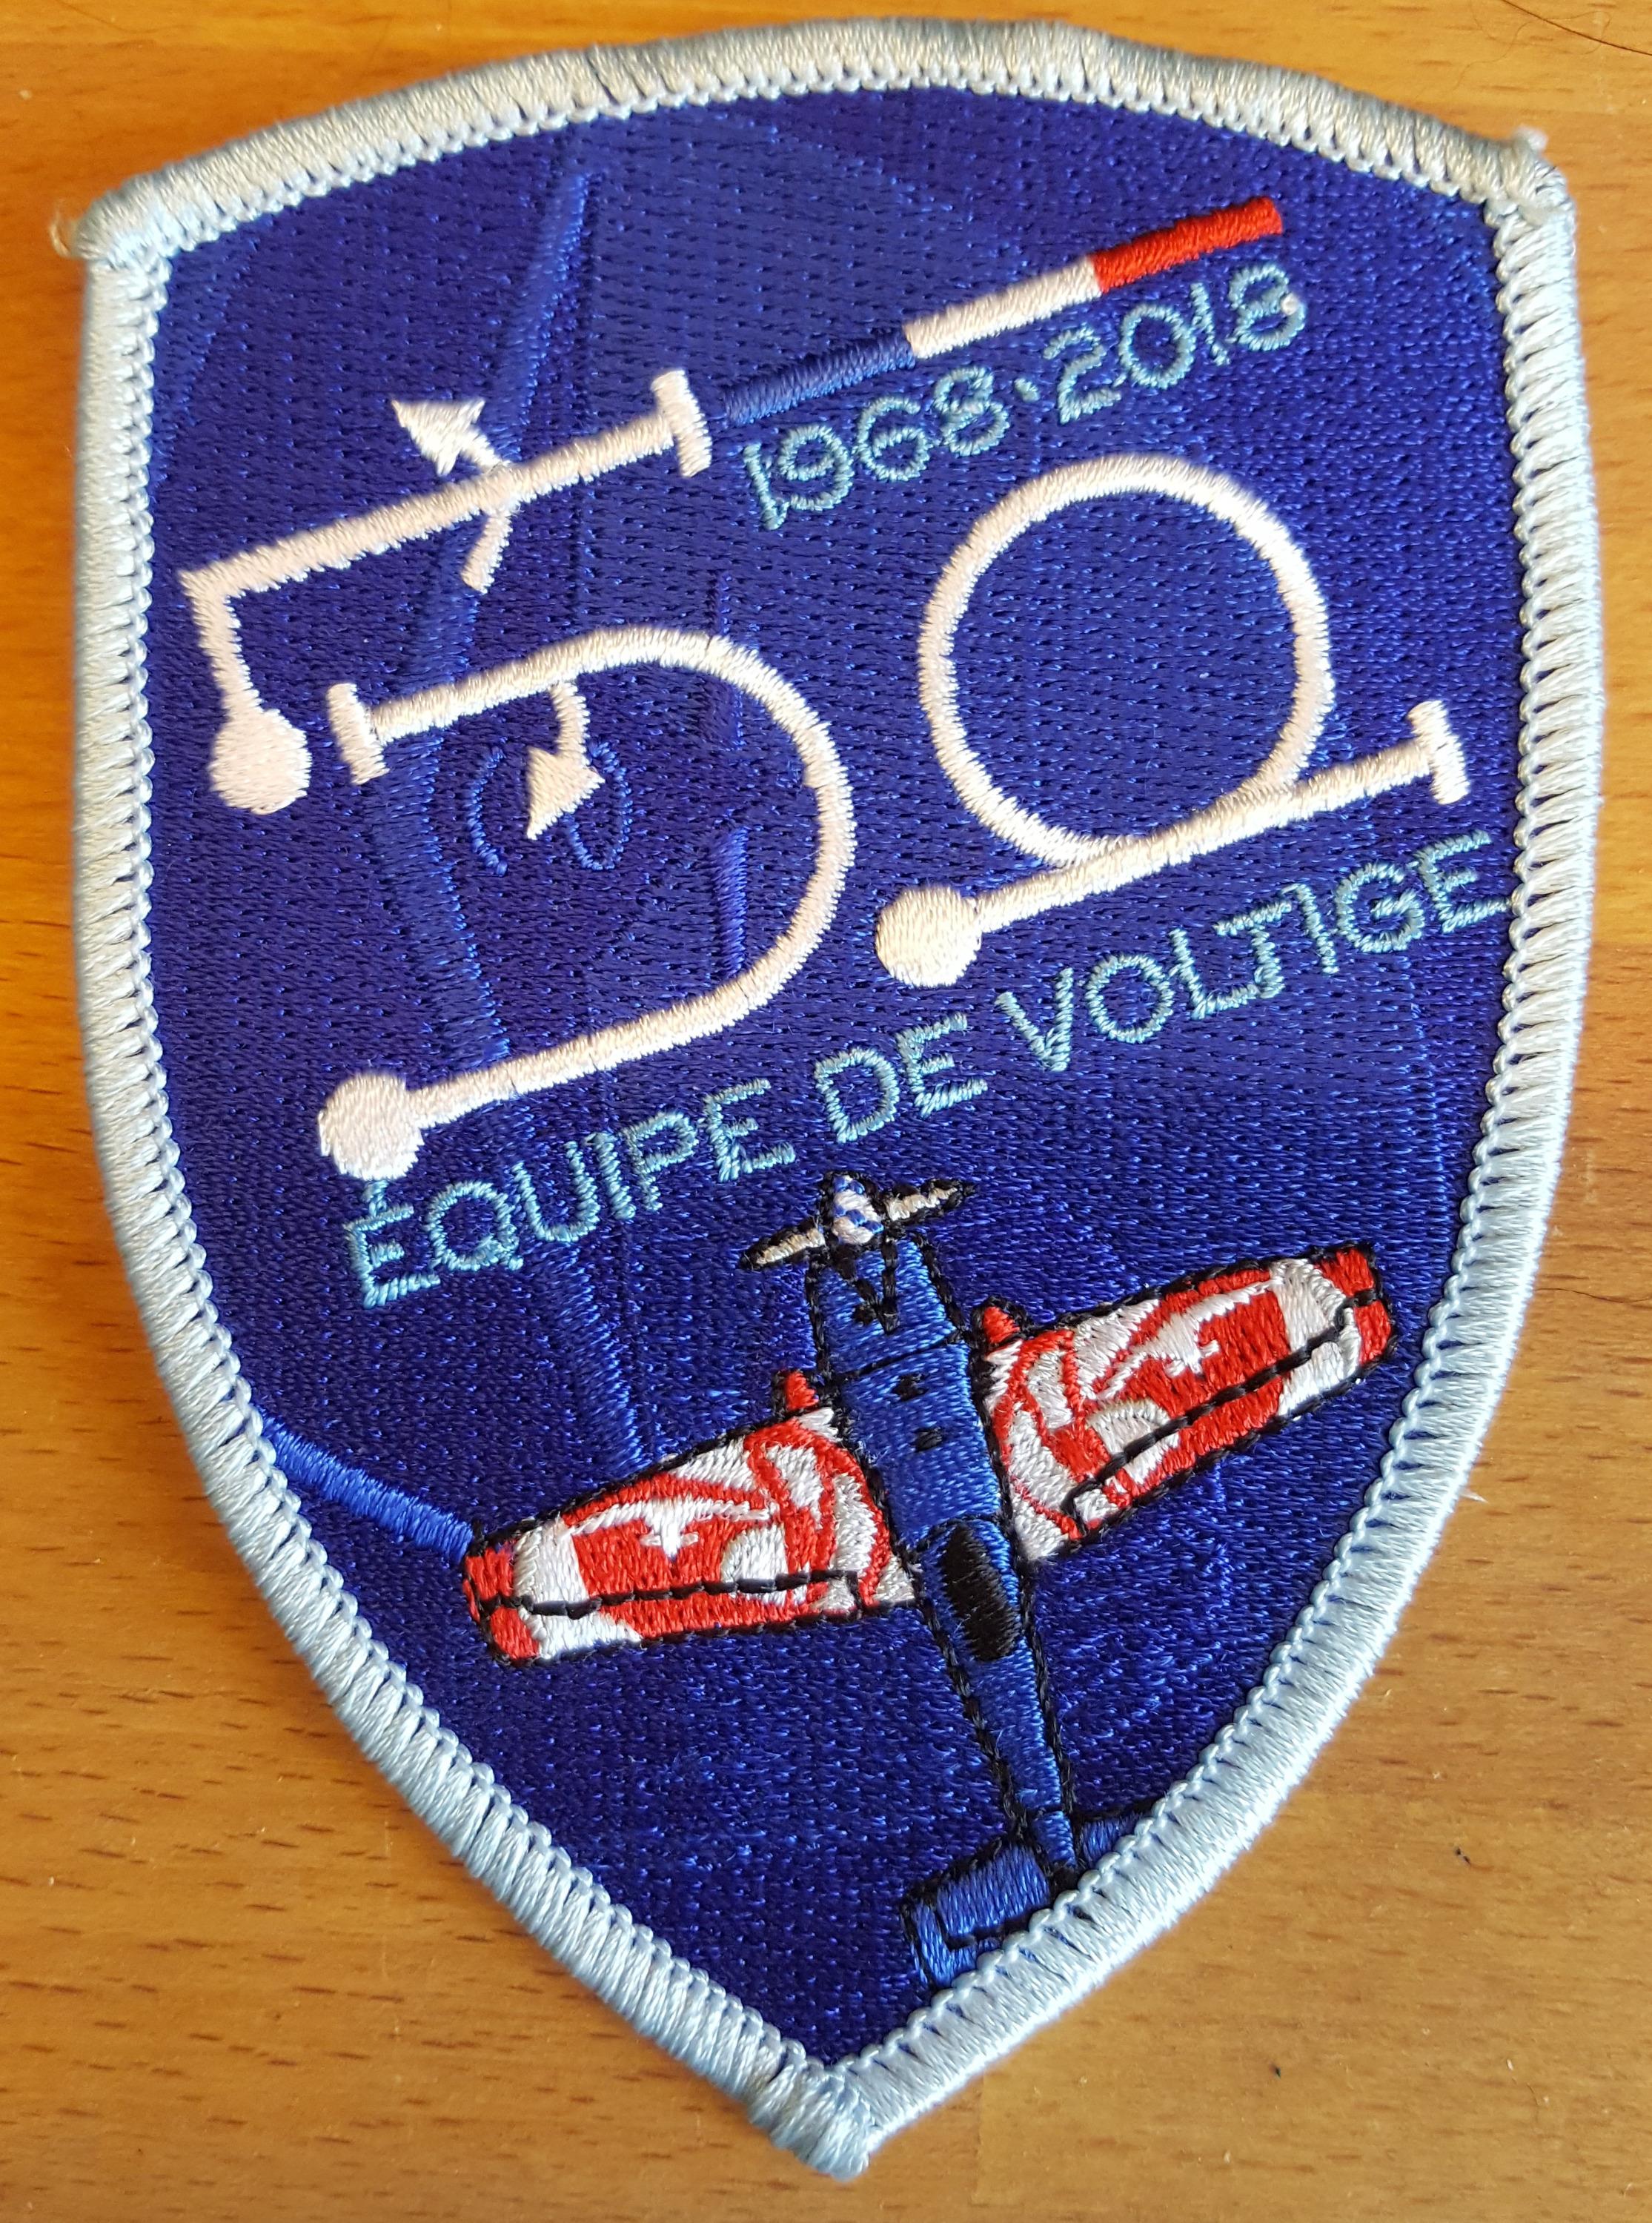 Equipe de France de voltige PN_edited